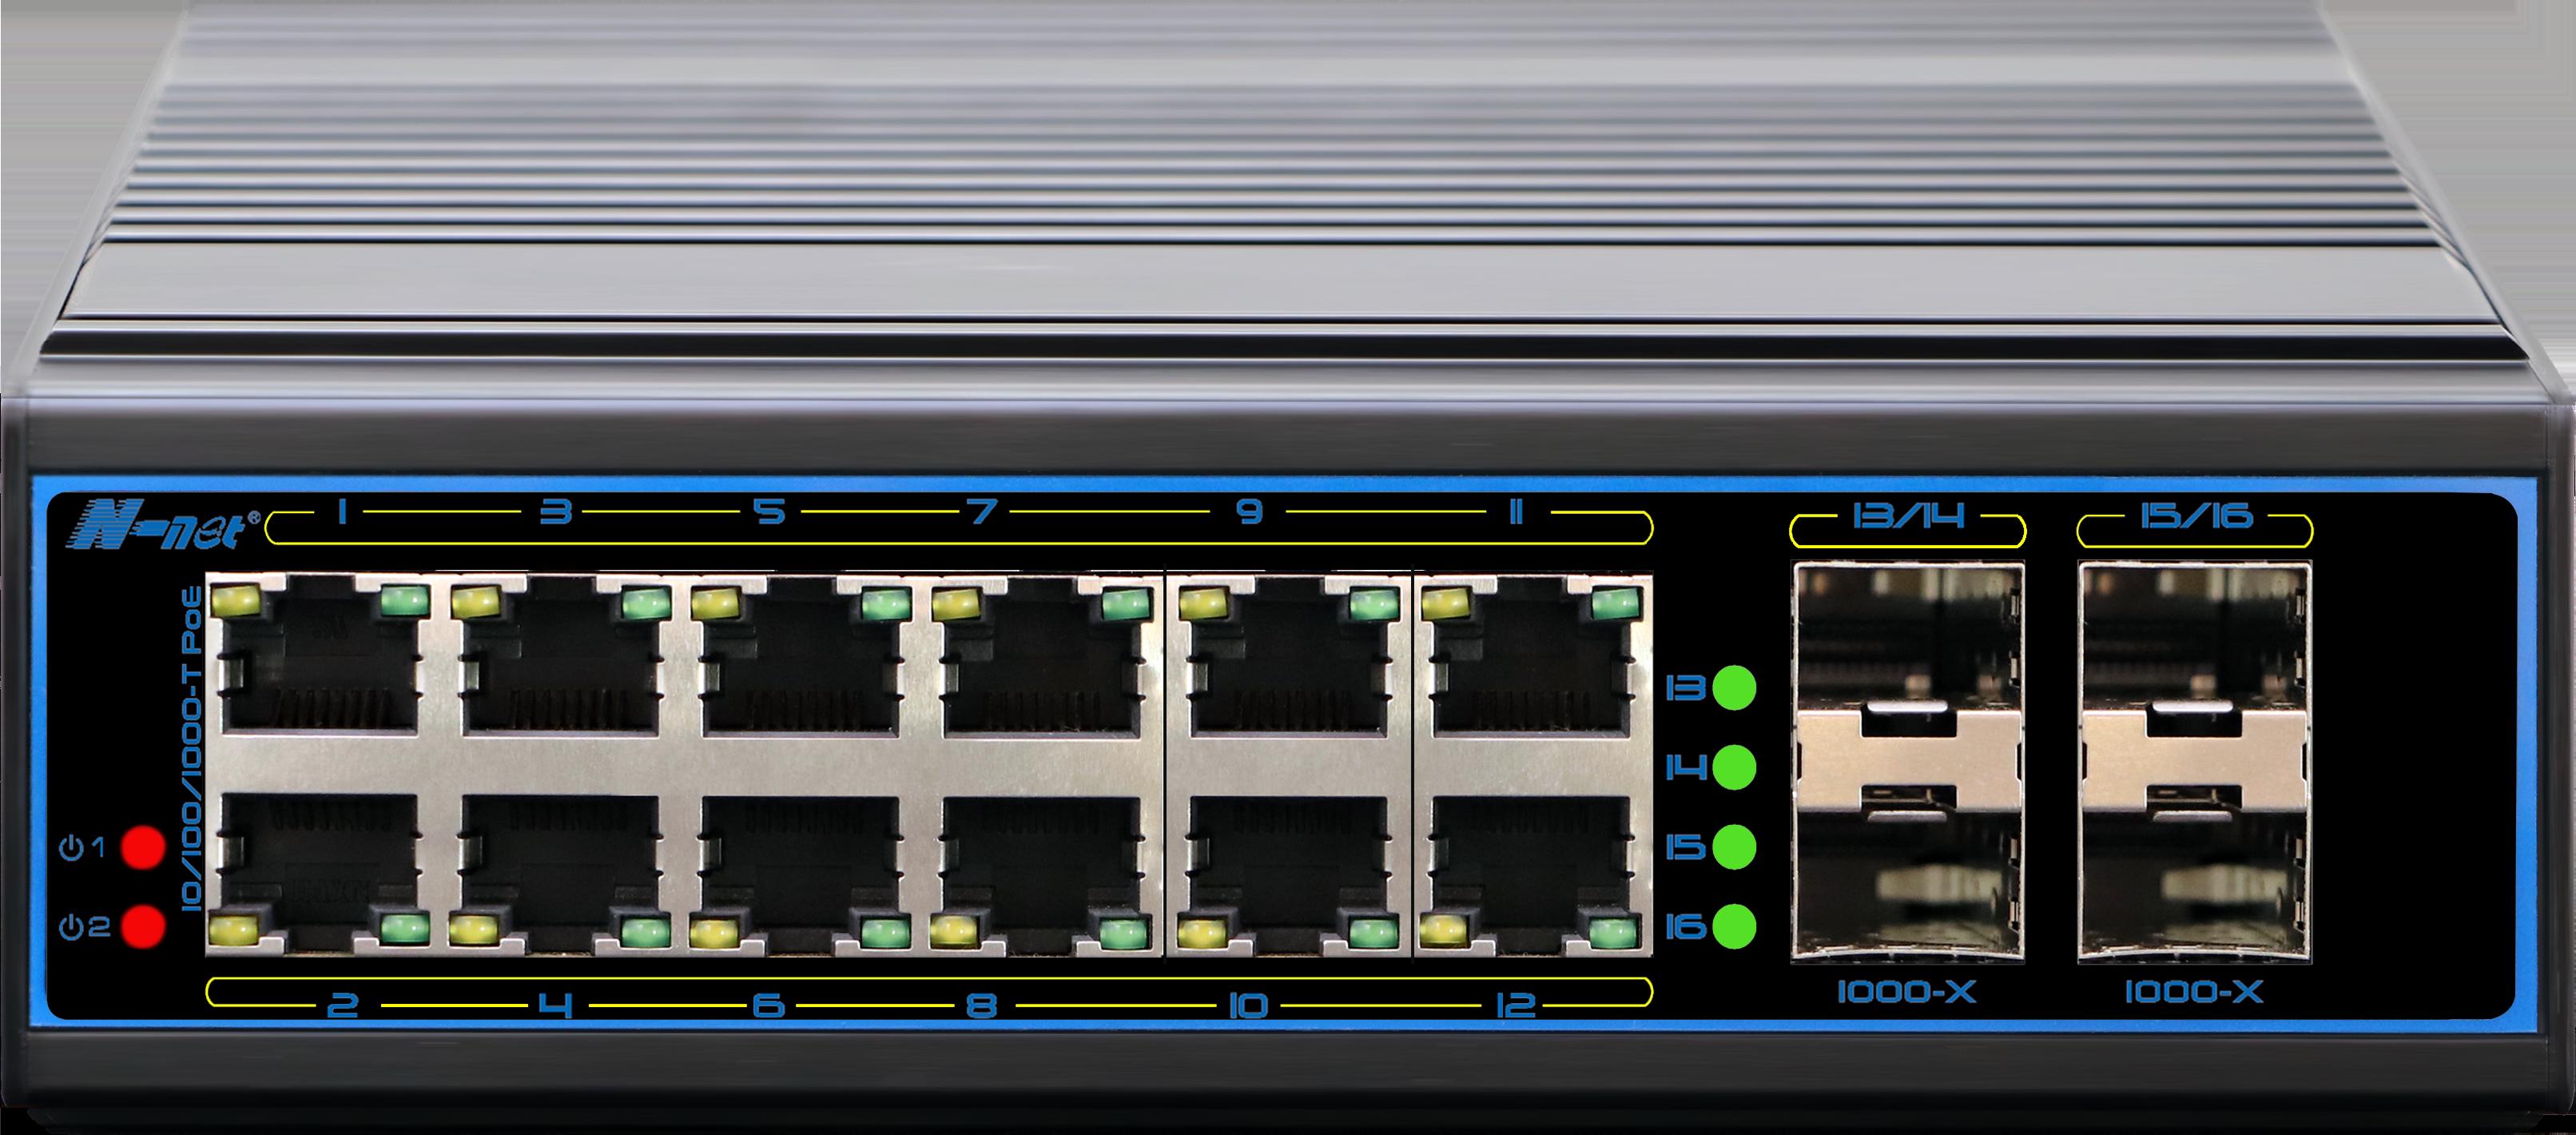 NIE8124PGM 16口全千兆网管型工业PoE交换机